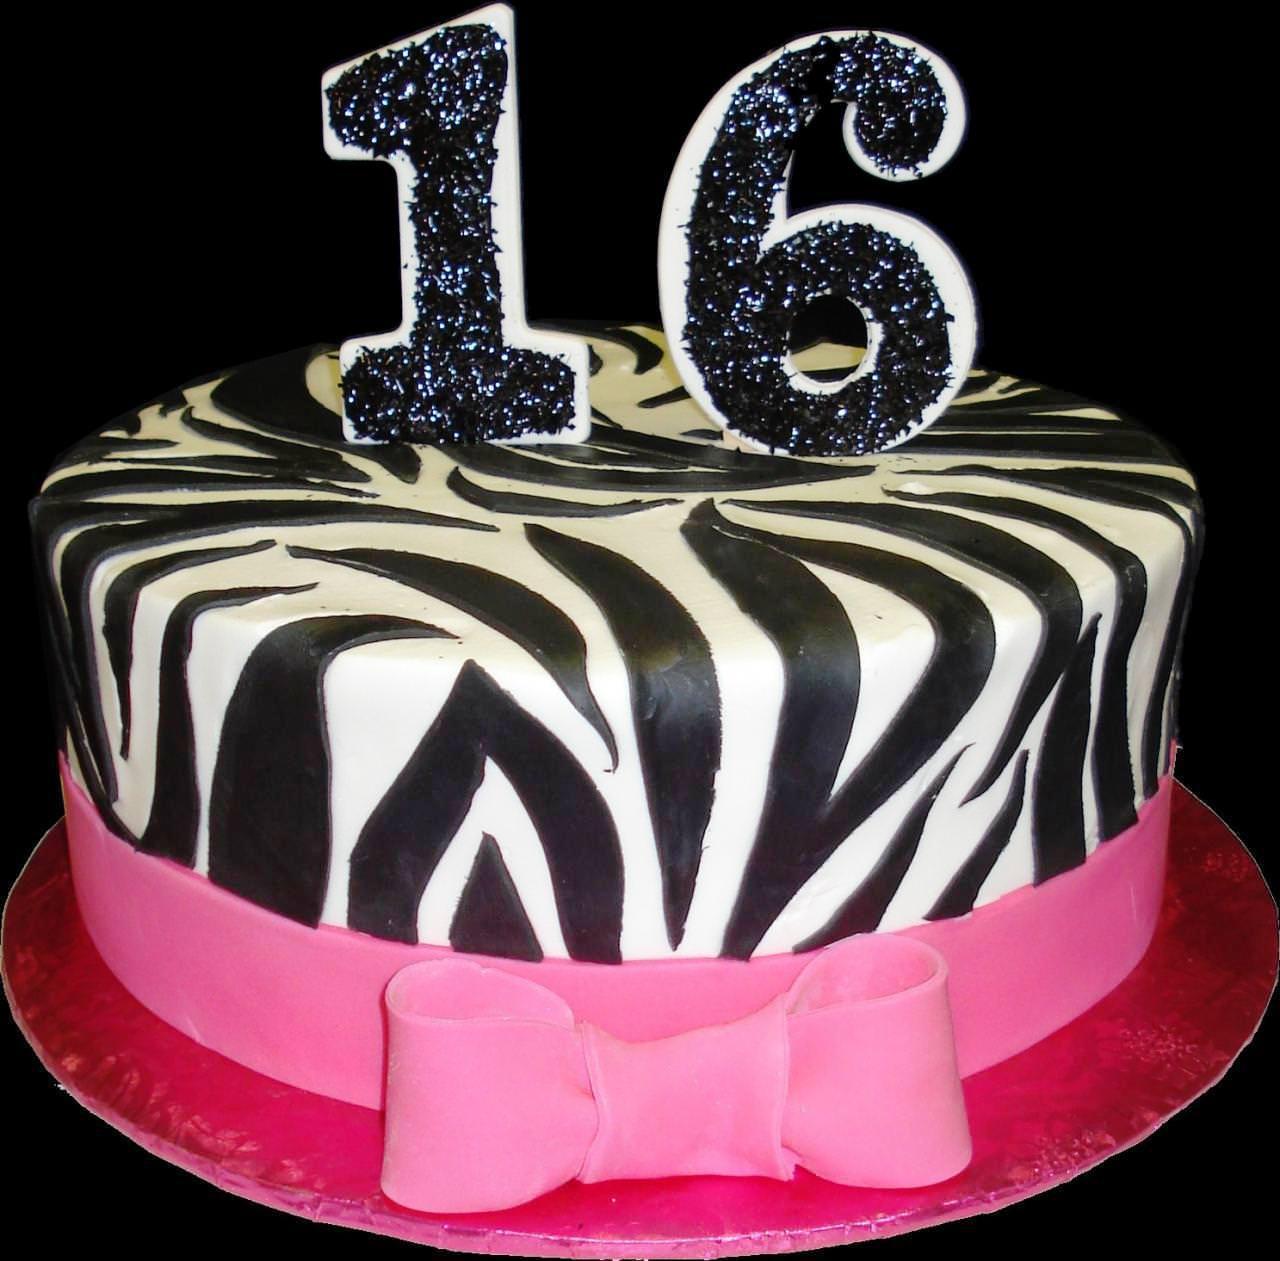 Sweet 16 Birthday Cake 16th Cakes Ideas For Boys Protoblogr Design